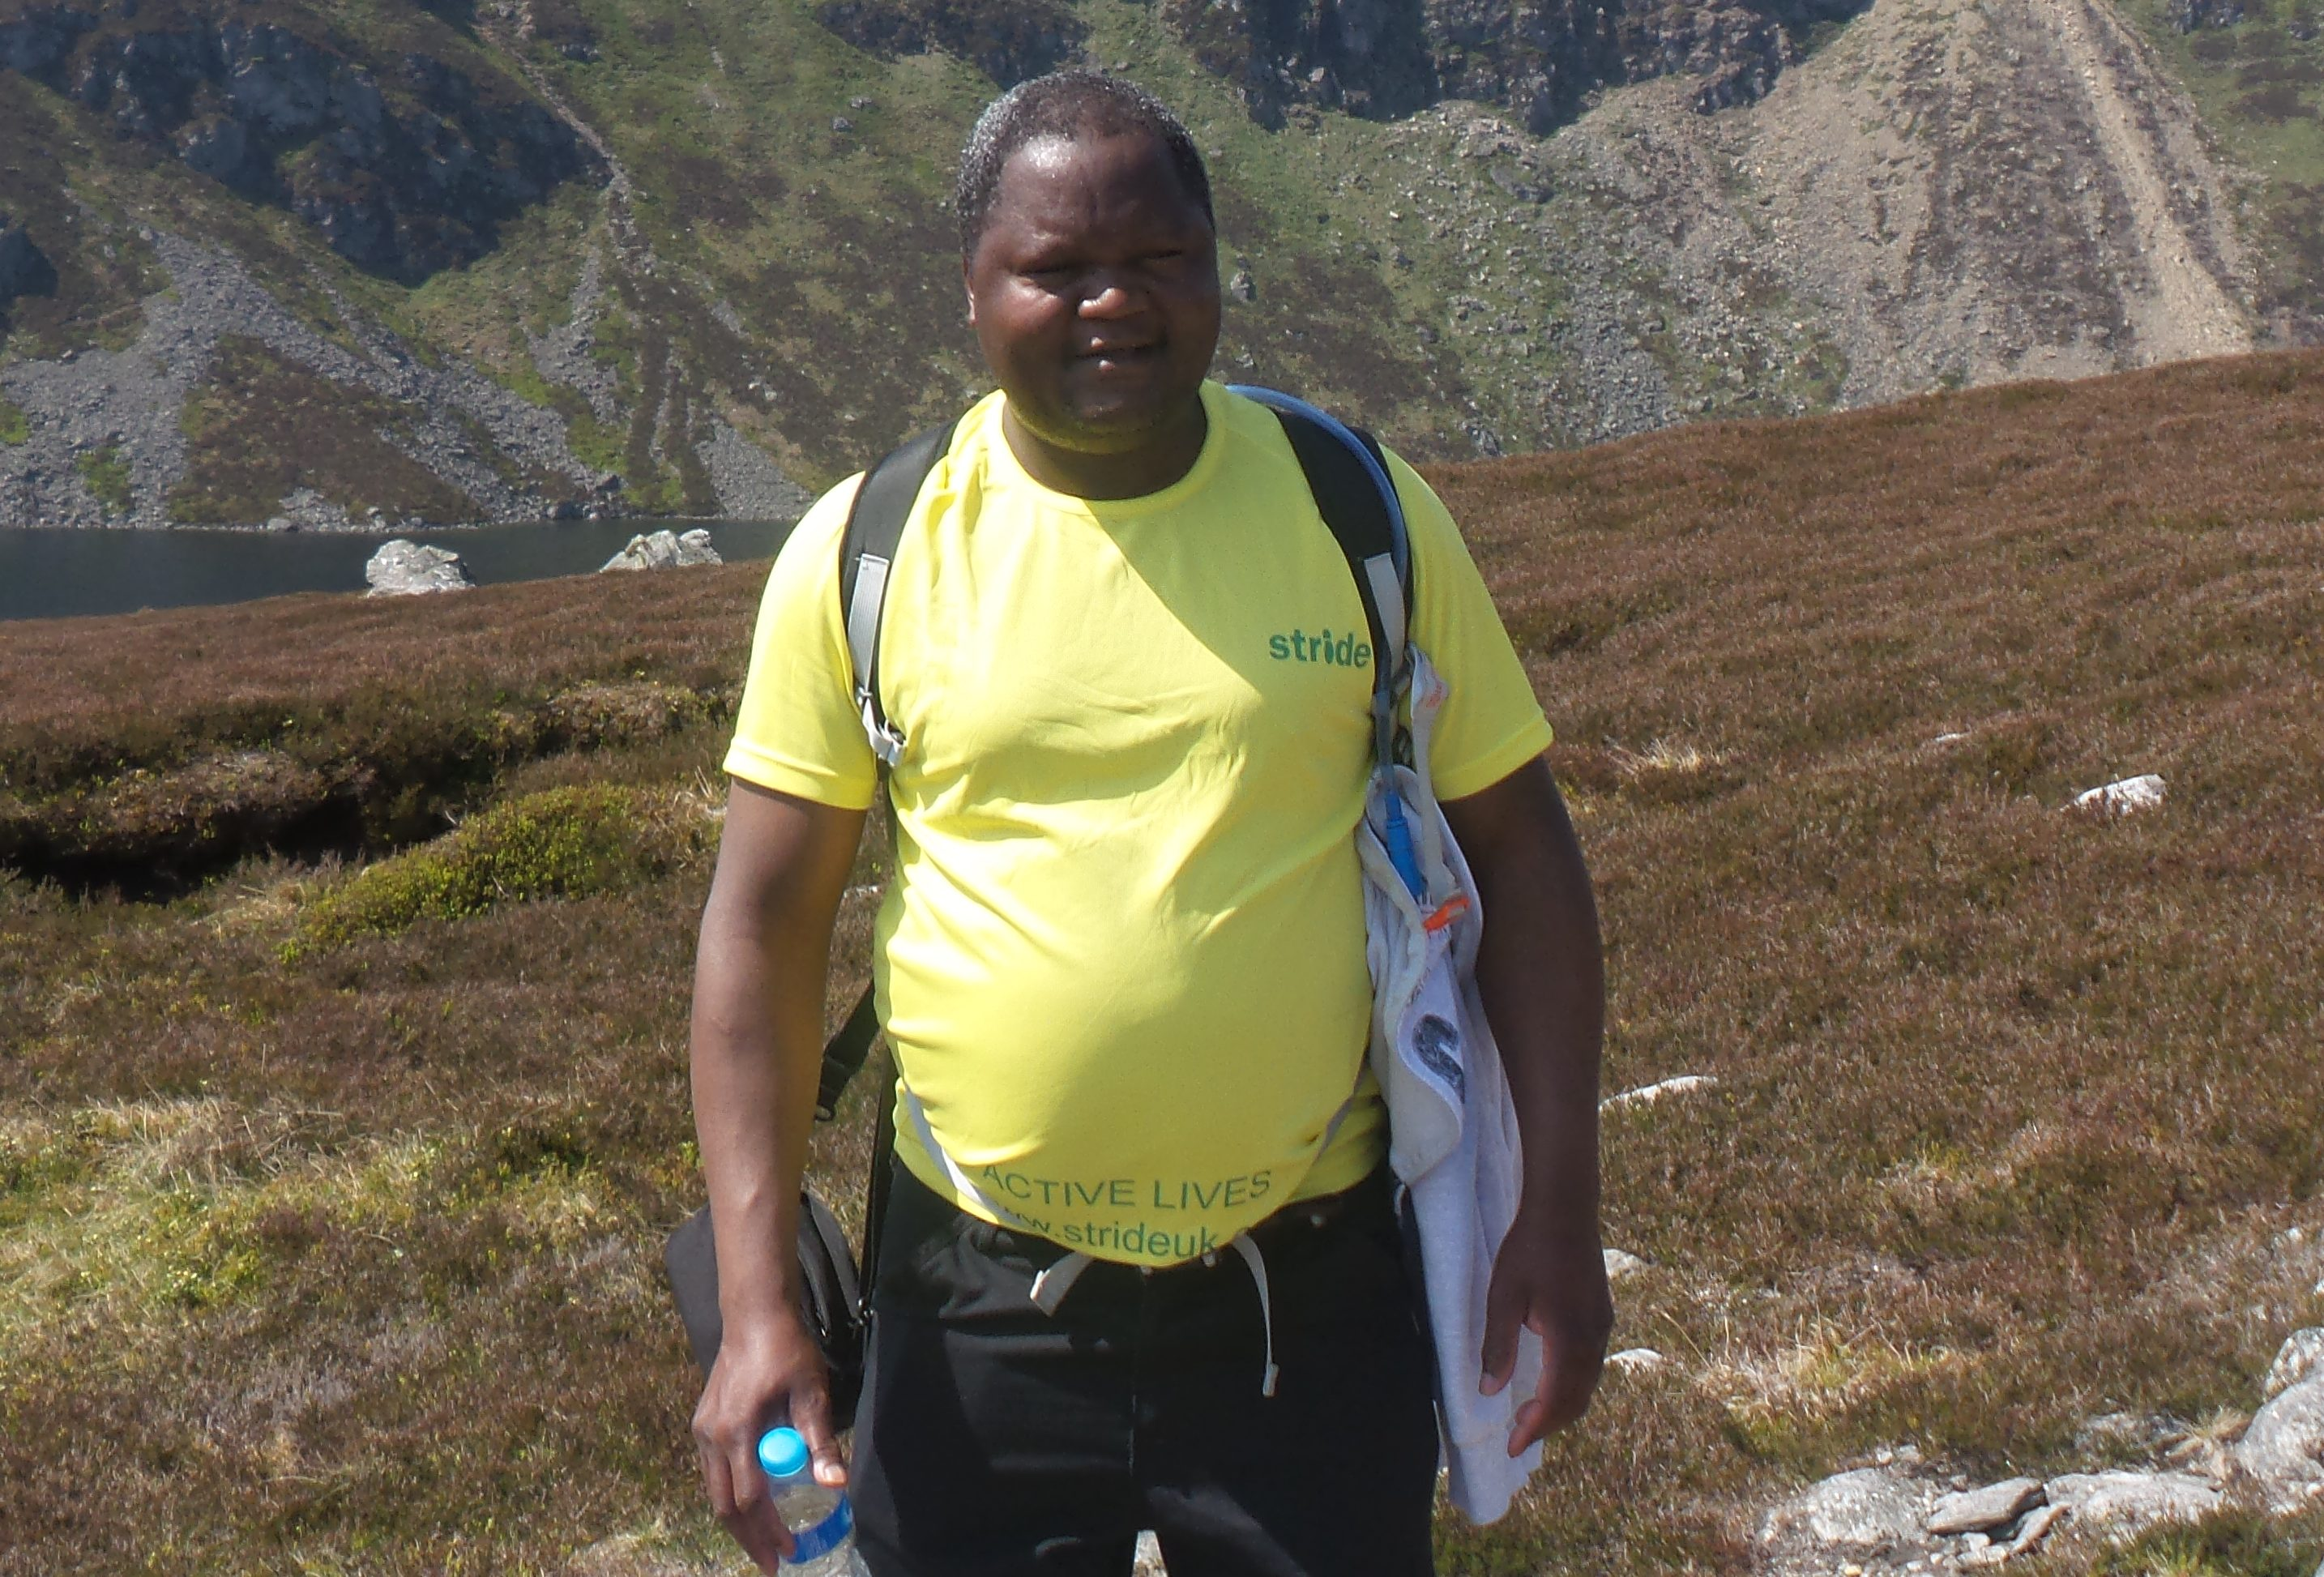 STRIDE secretary Joseph Lumbasi